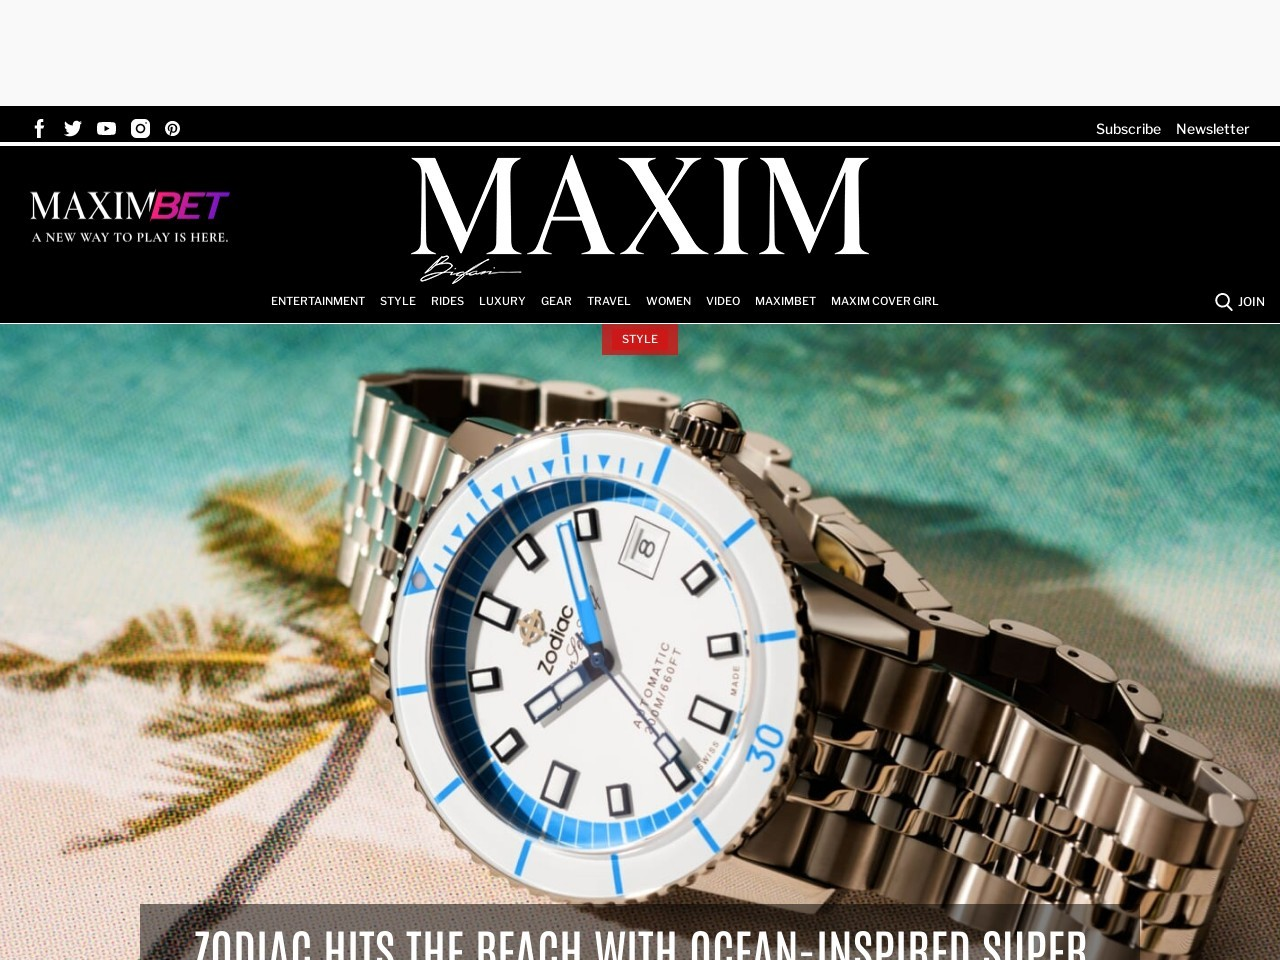 http://www.maxim.com/preferred/OrisVIPSweeps